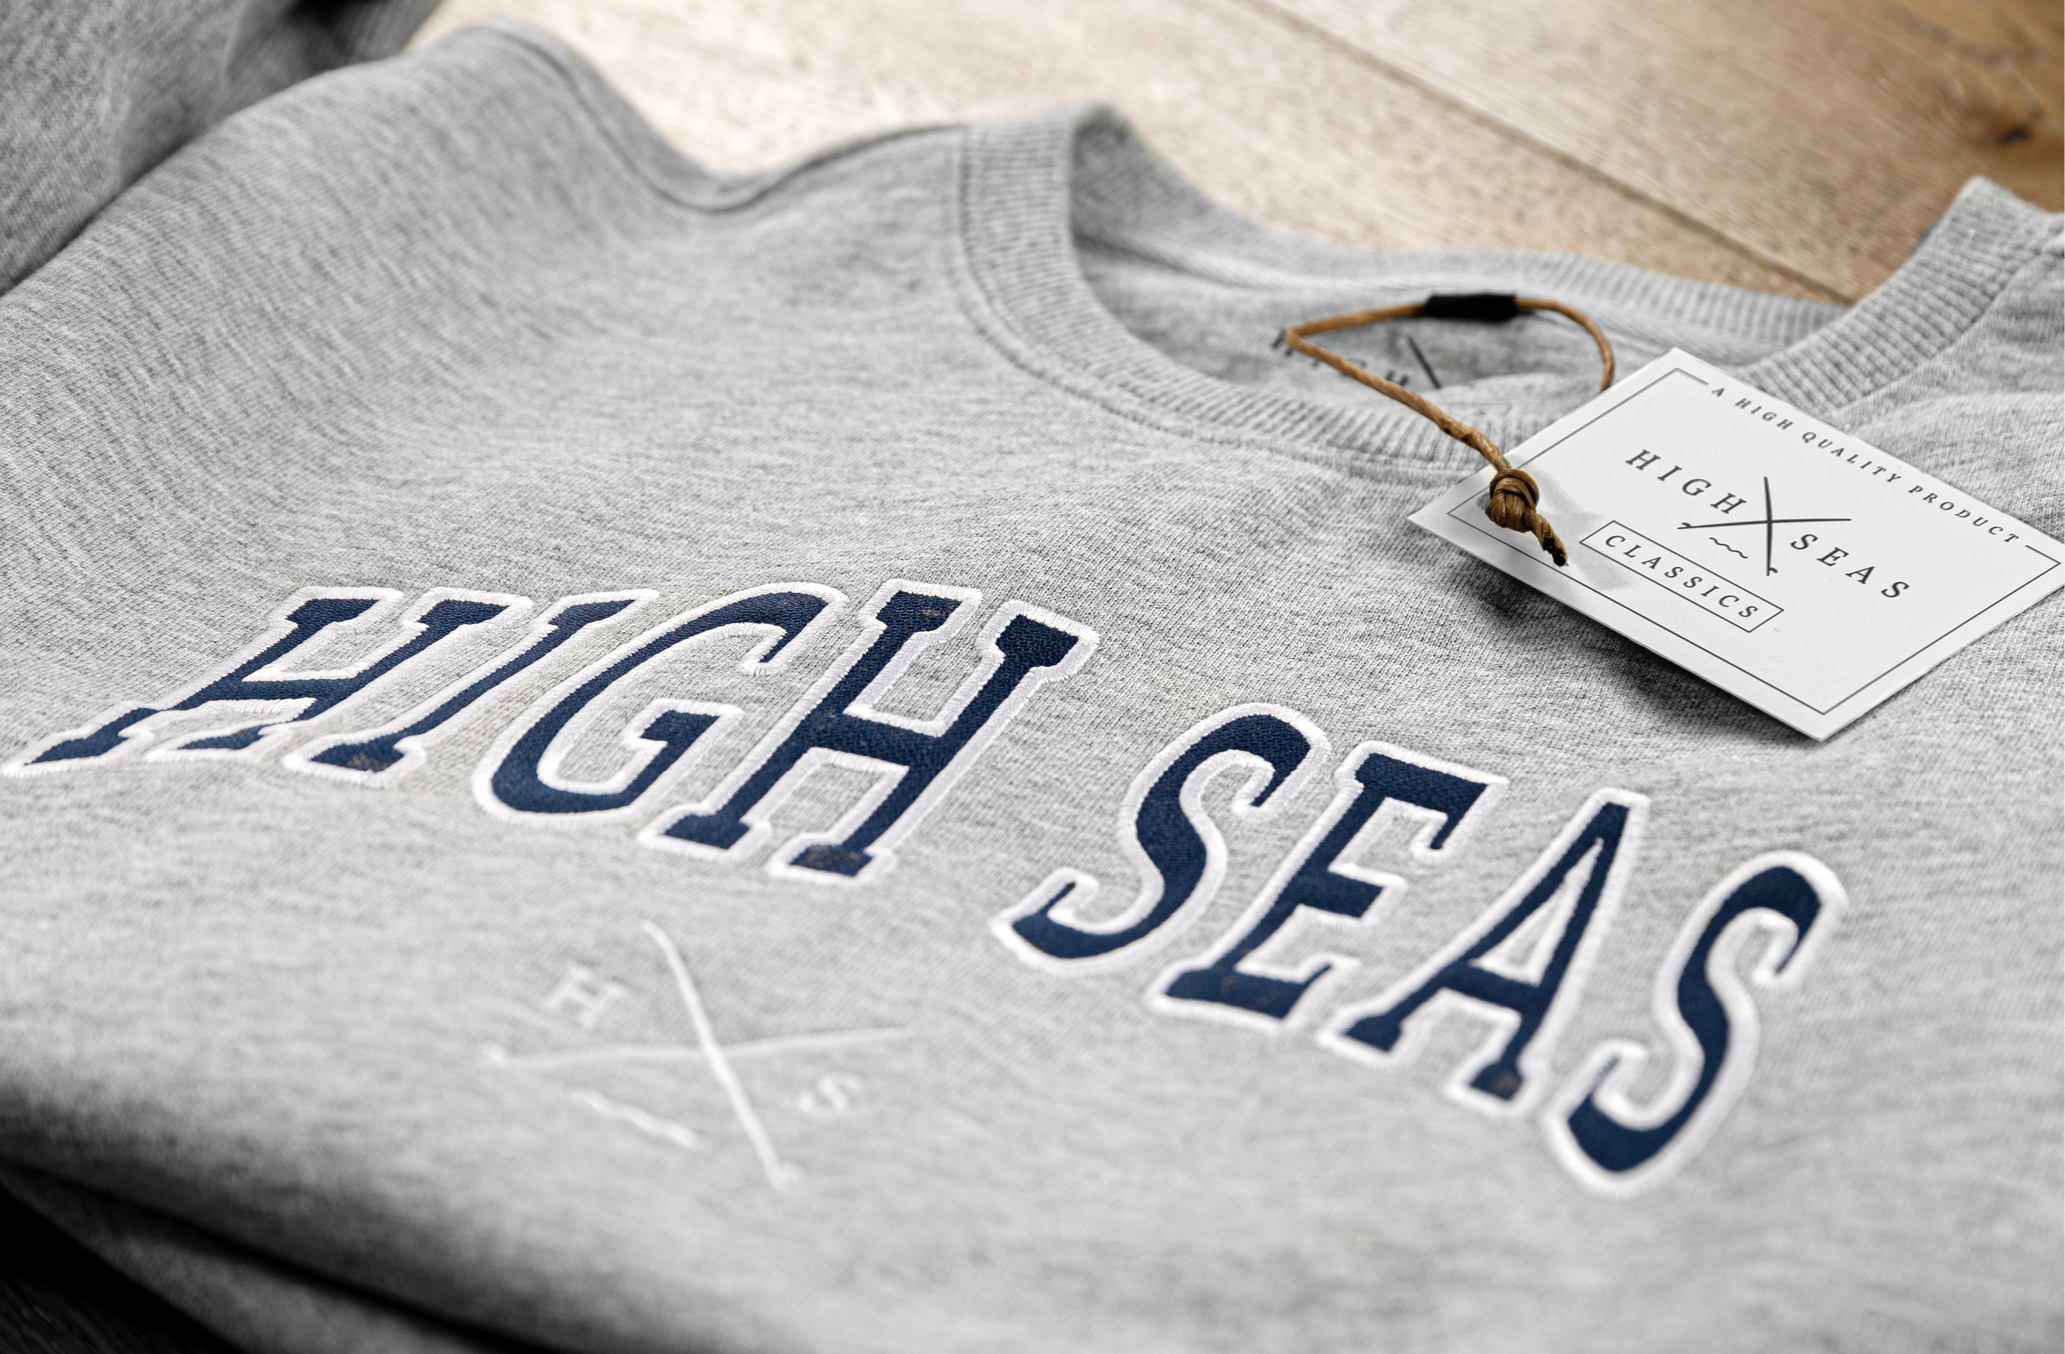 Coorporate Design und HighSeas Classic Collection